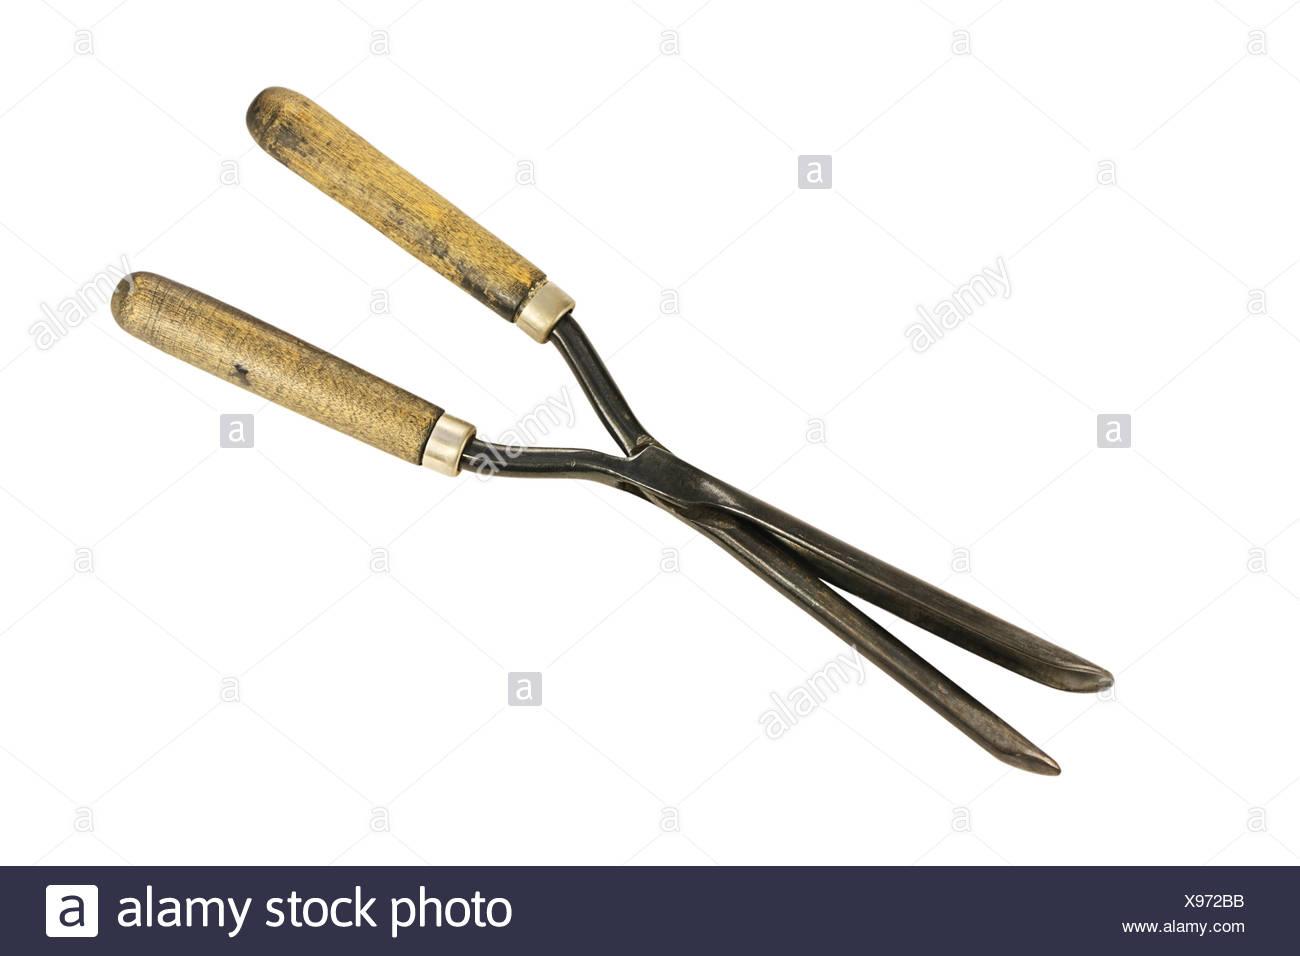 Vintage curling tongs - Stock Image